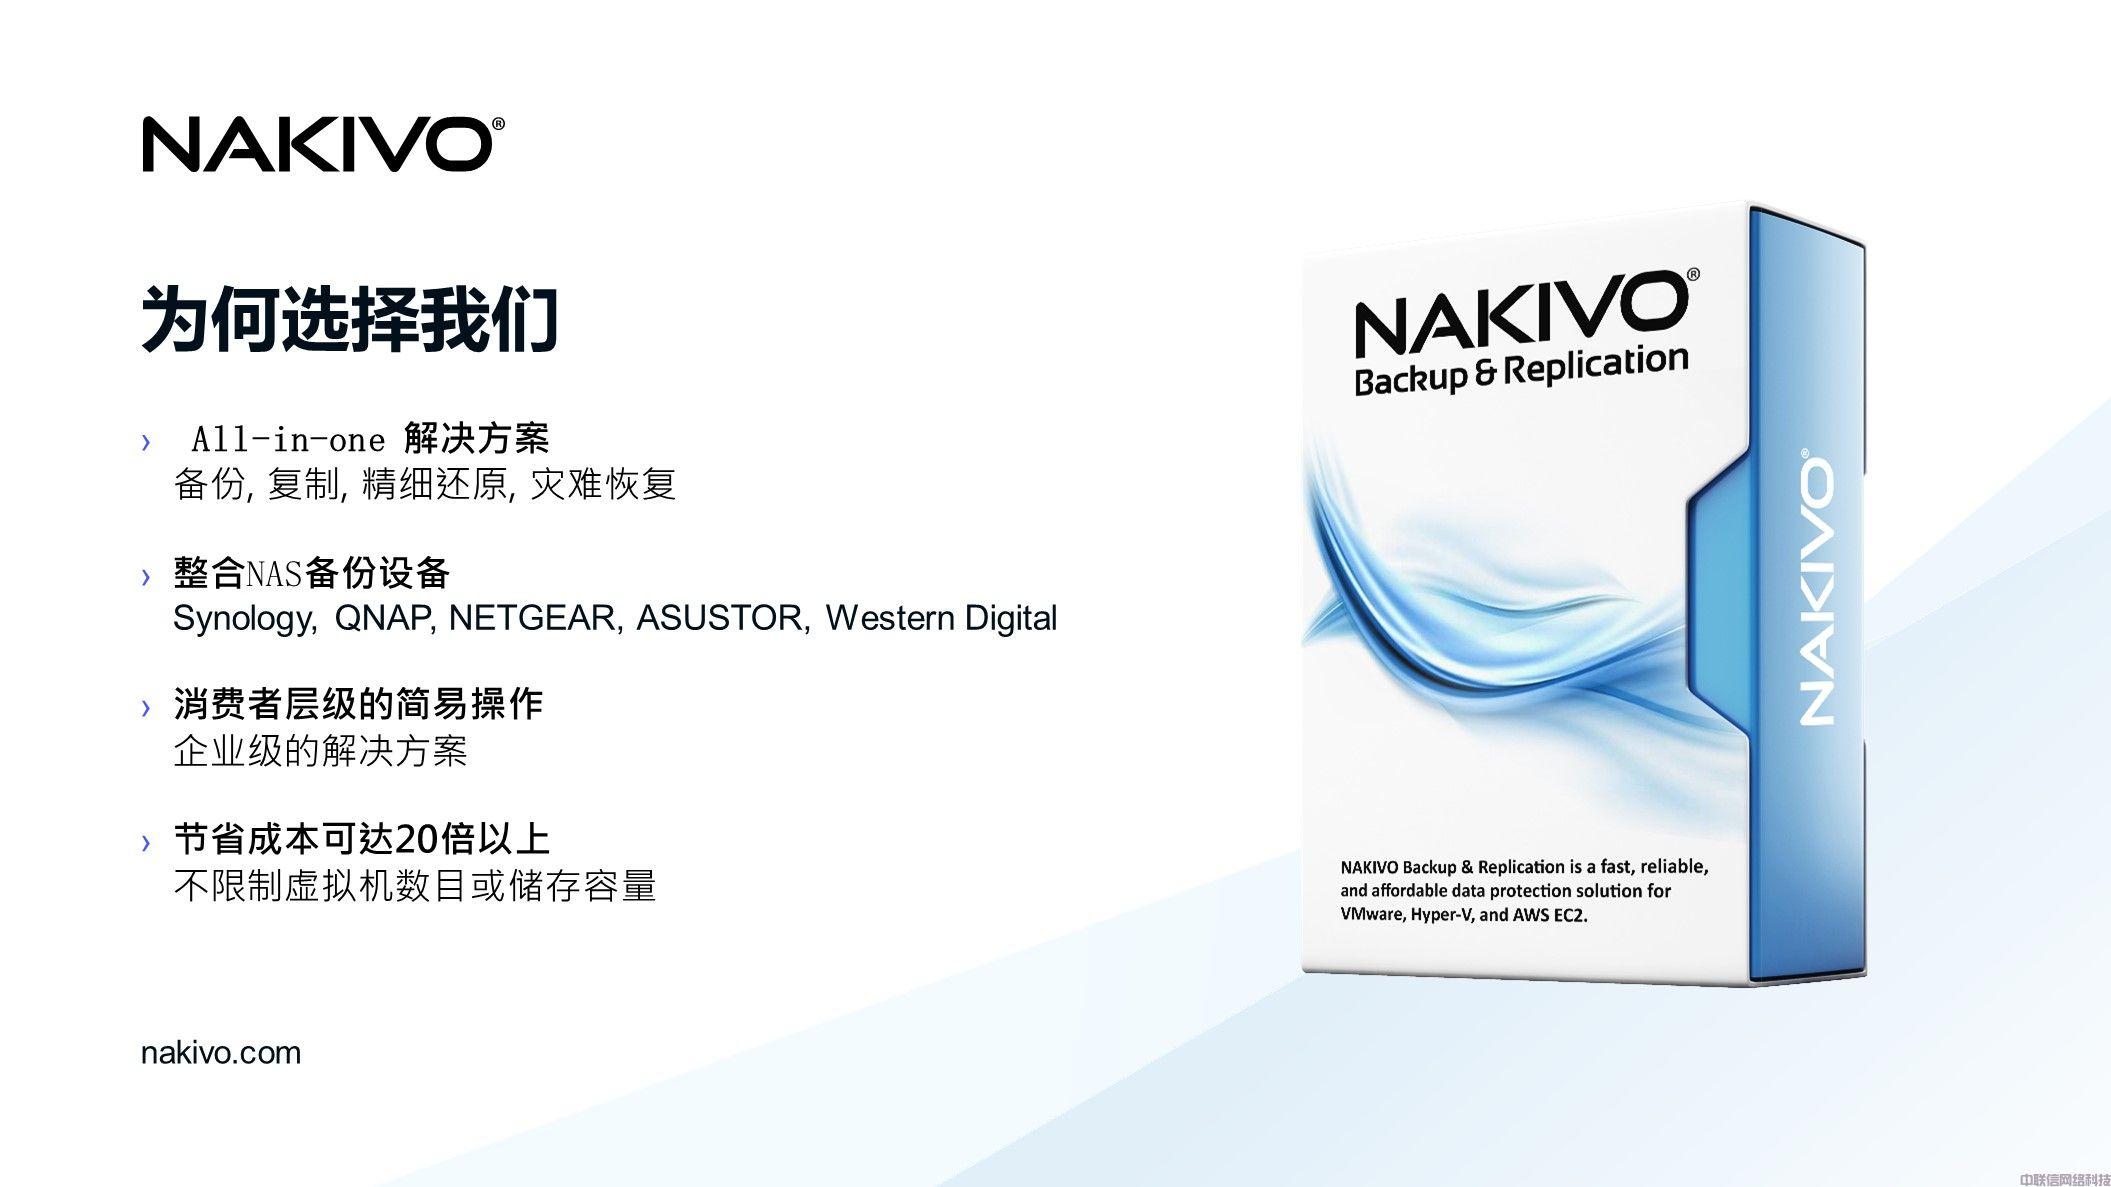 虚拟化备份方案NAKIVO Backup & Replication(图9)